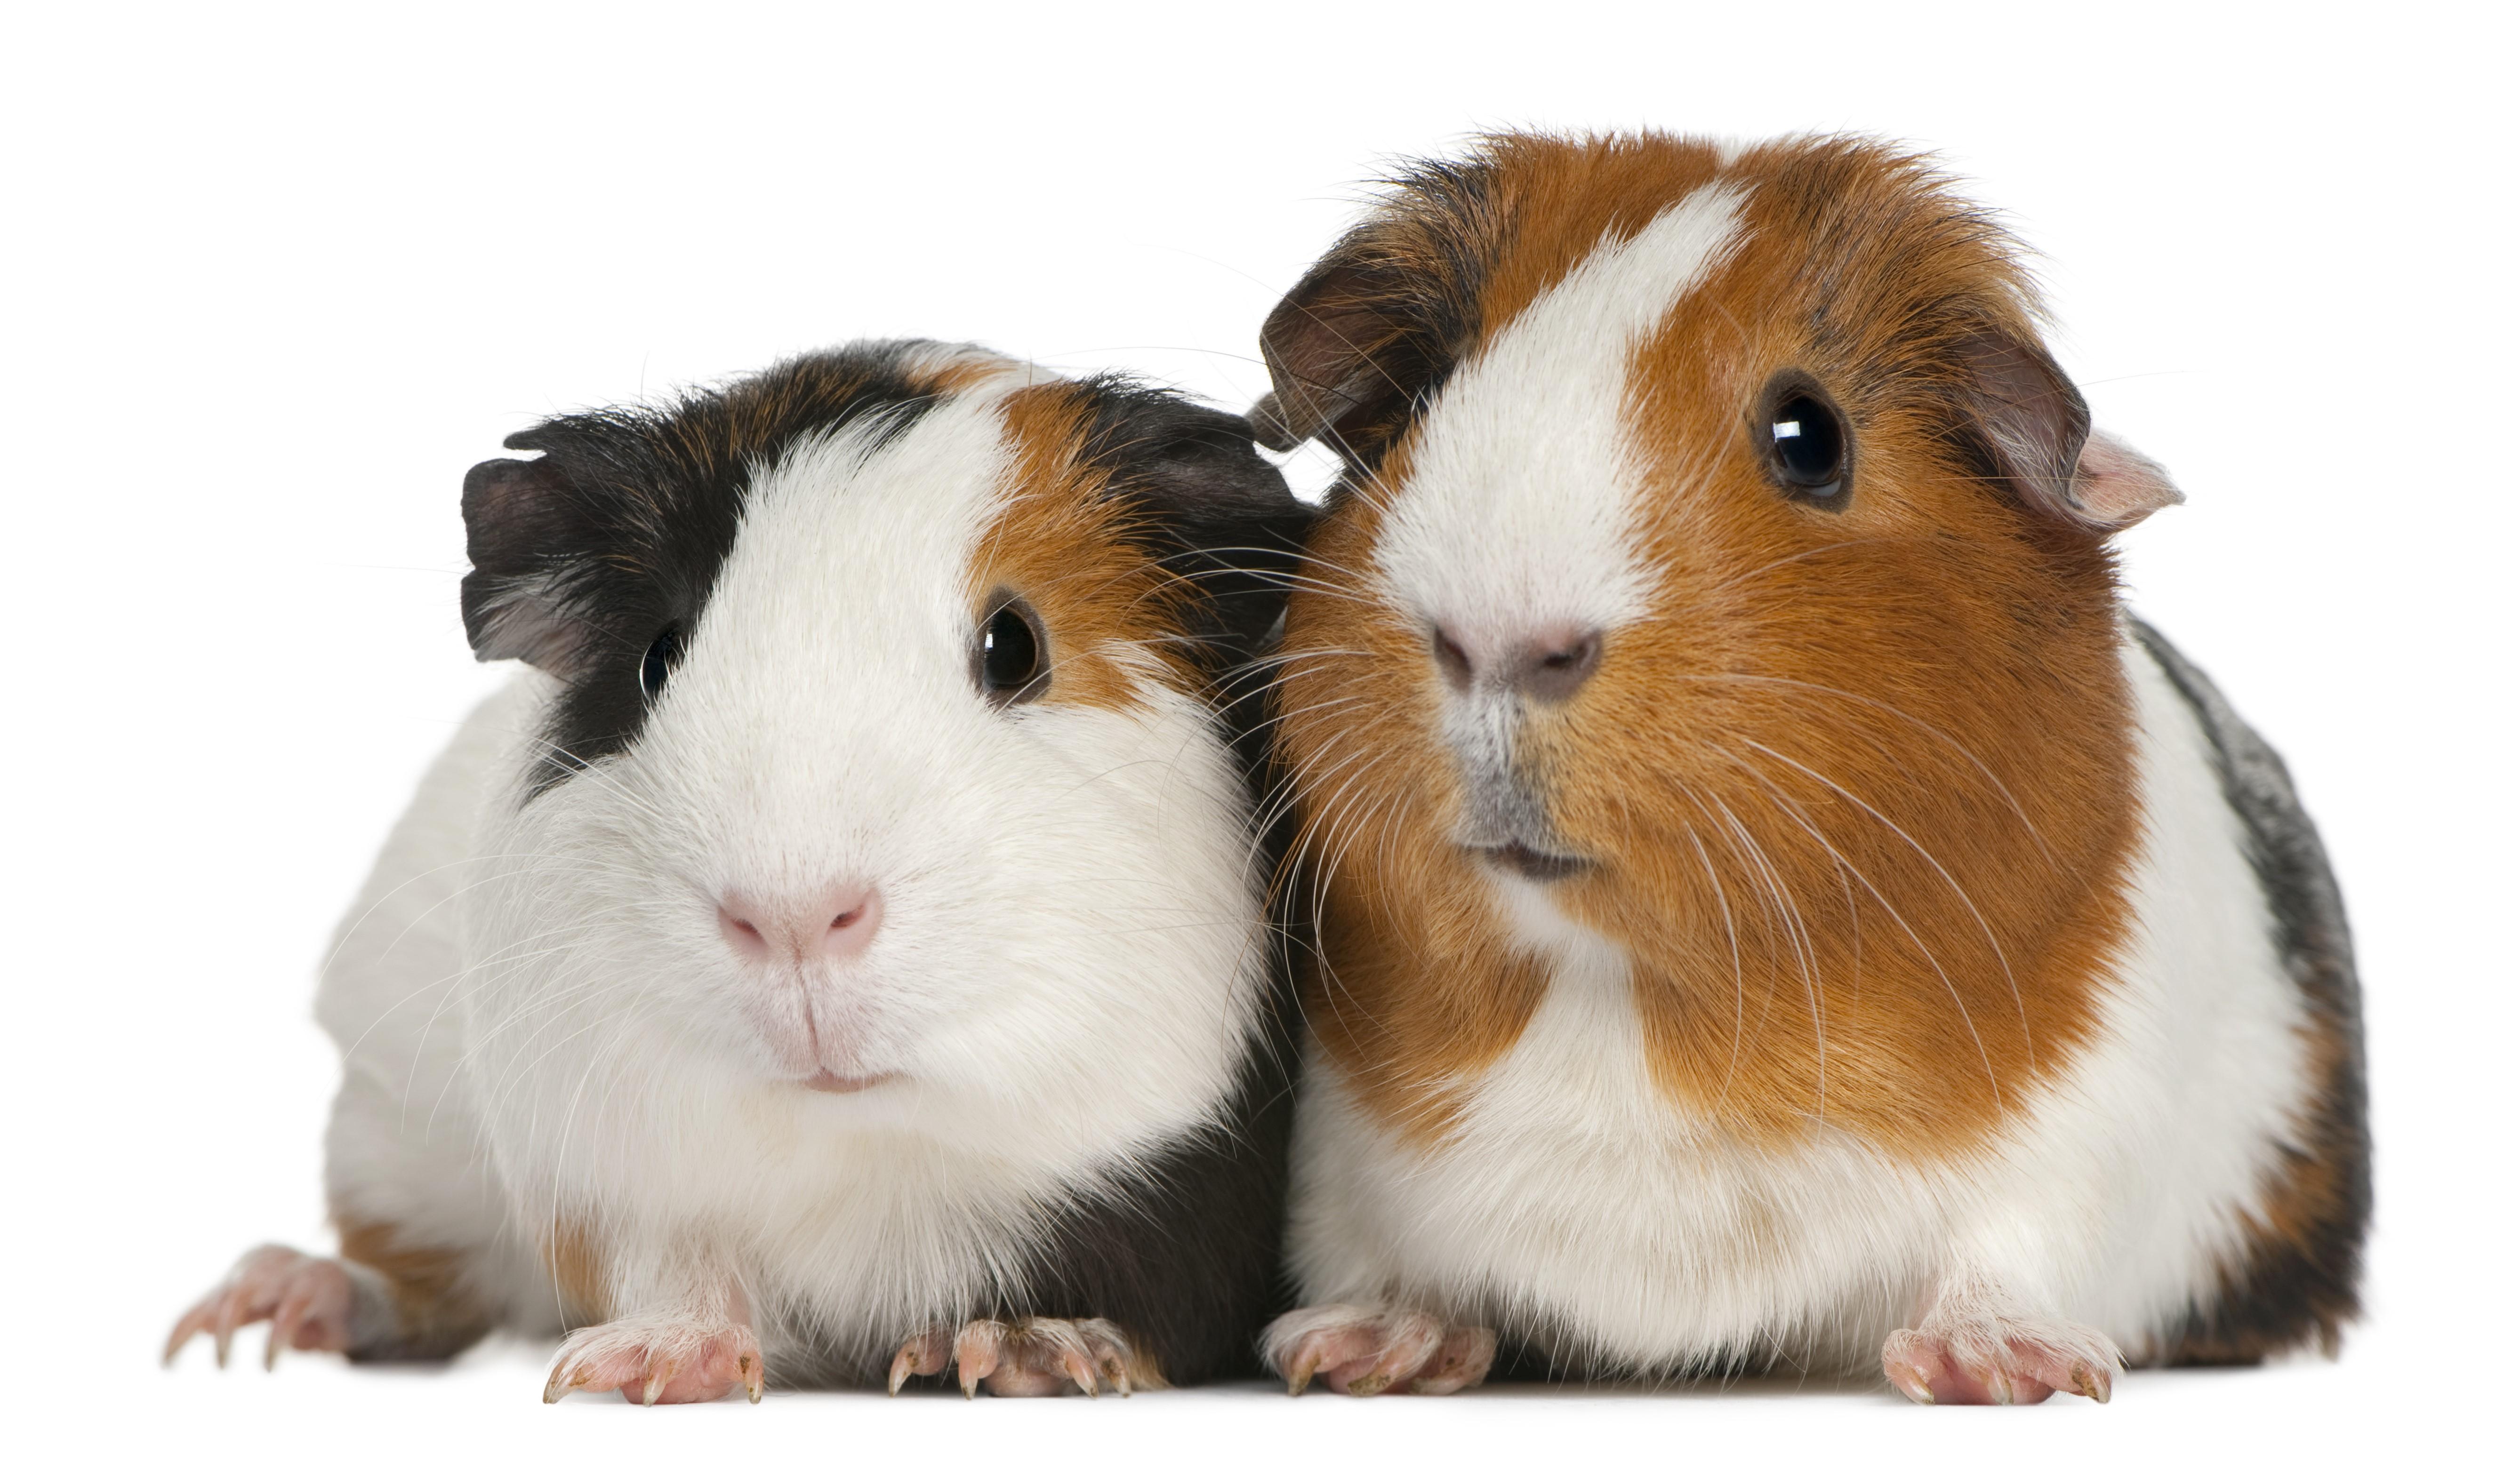 Suitabel Guinea Pig housing for animal welfare